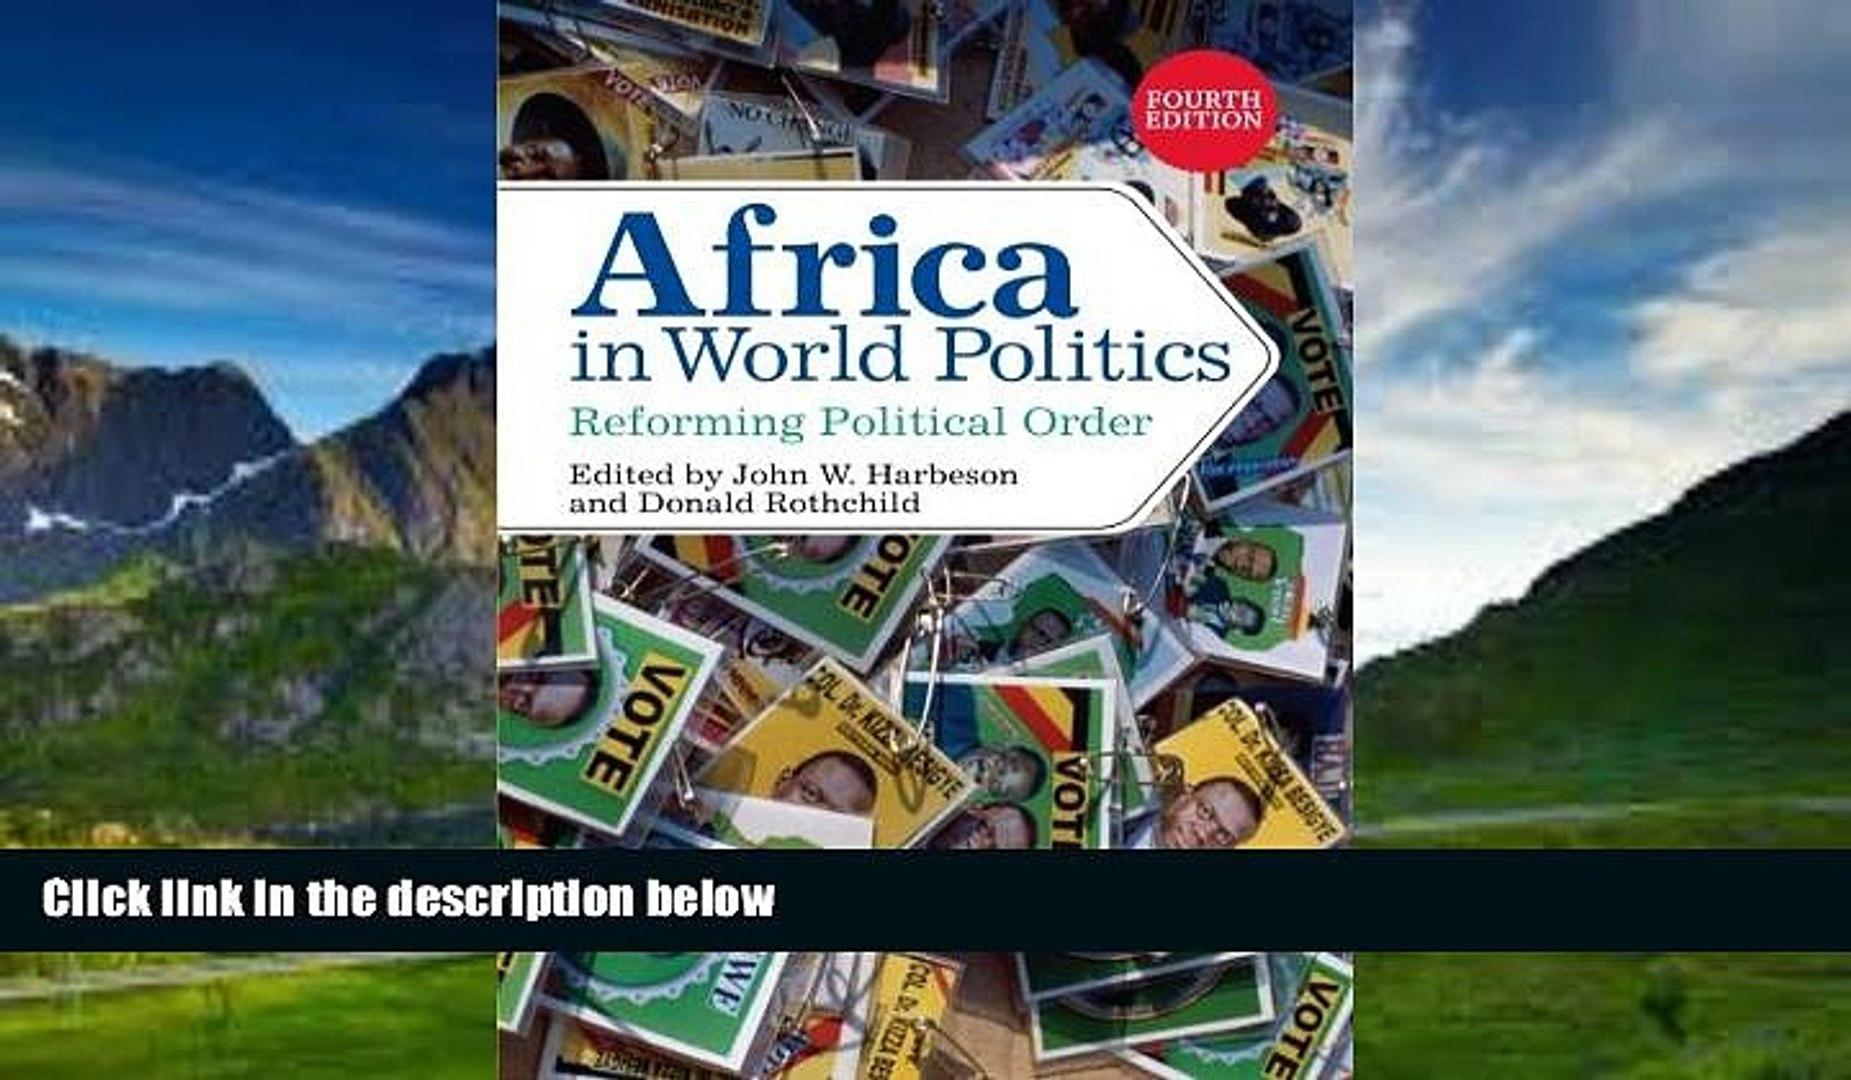 Books to Read  Africa in World Politics: Reforming Political Order  Full Ebooks Best Seller